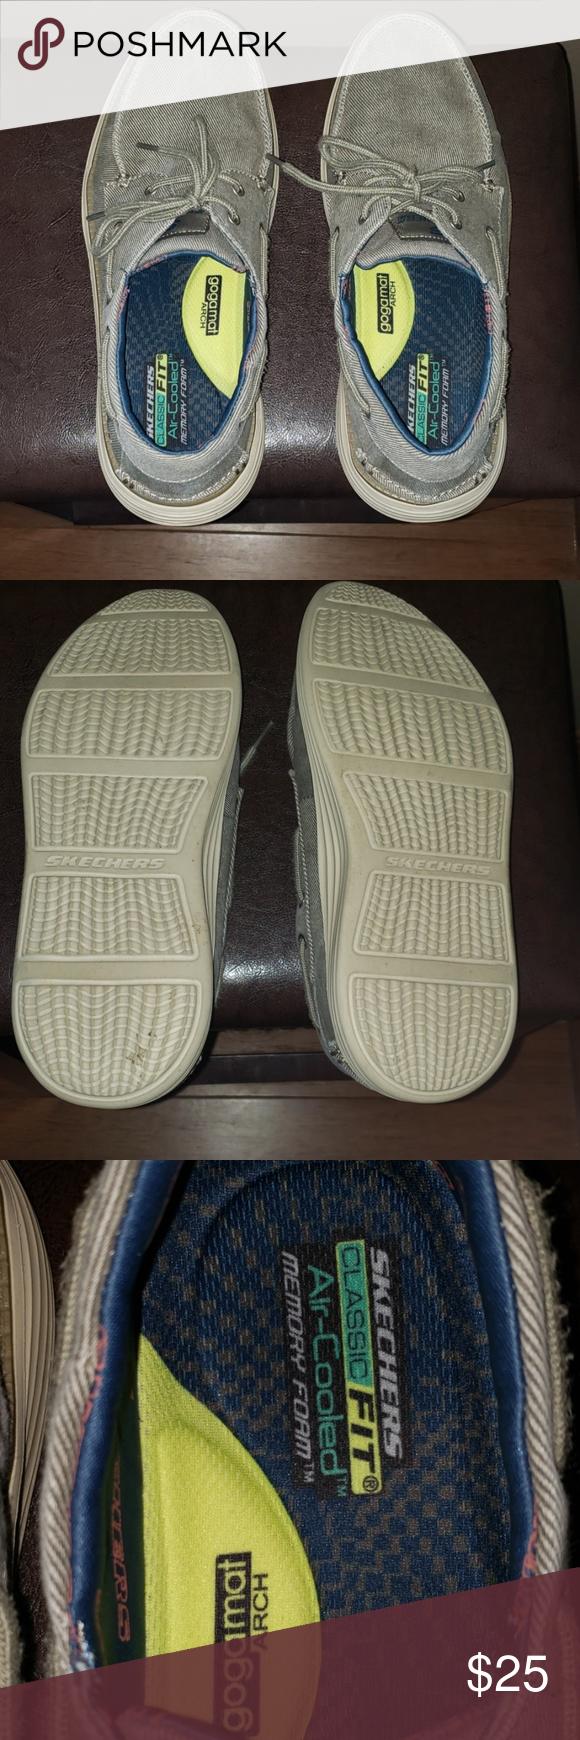 Mens Shoes Shoes Mens Mens Skechers Skechers Shoes